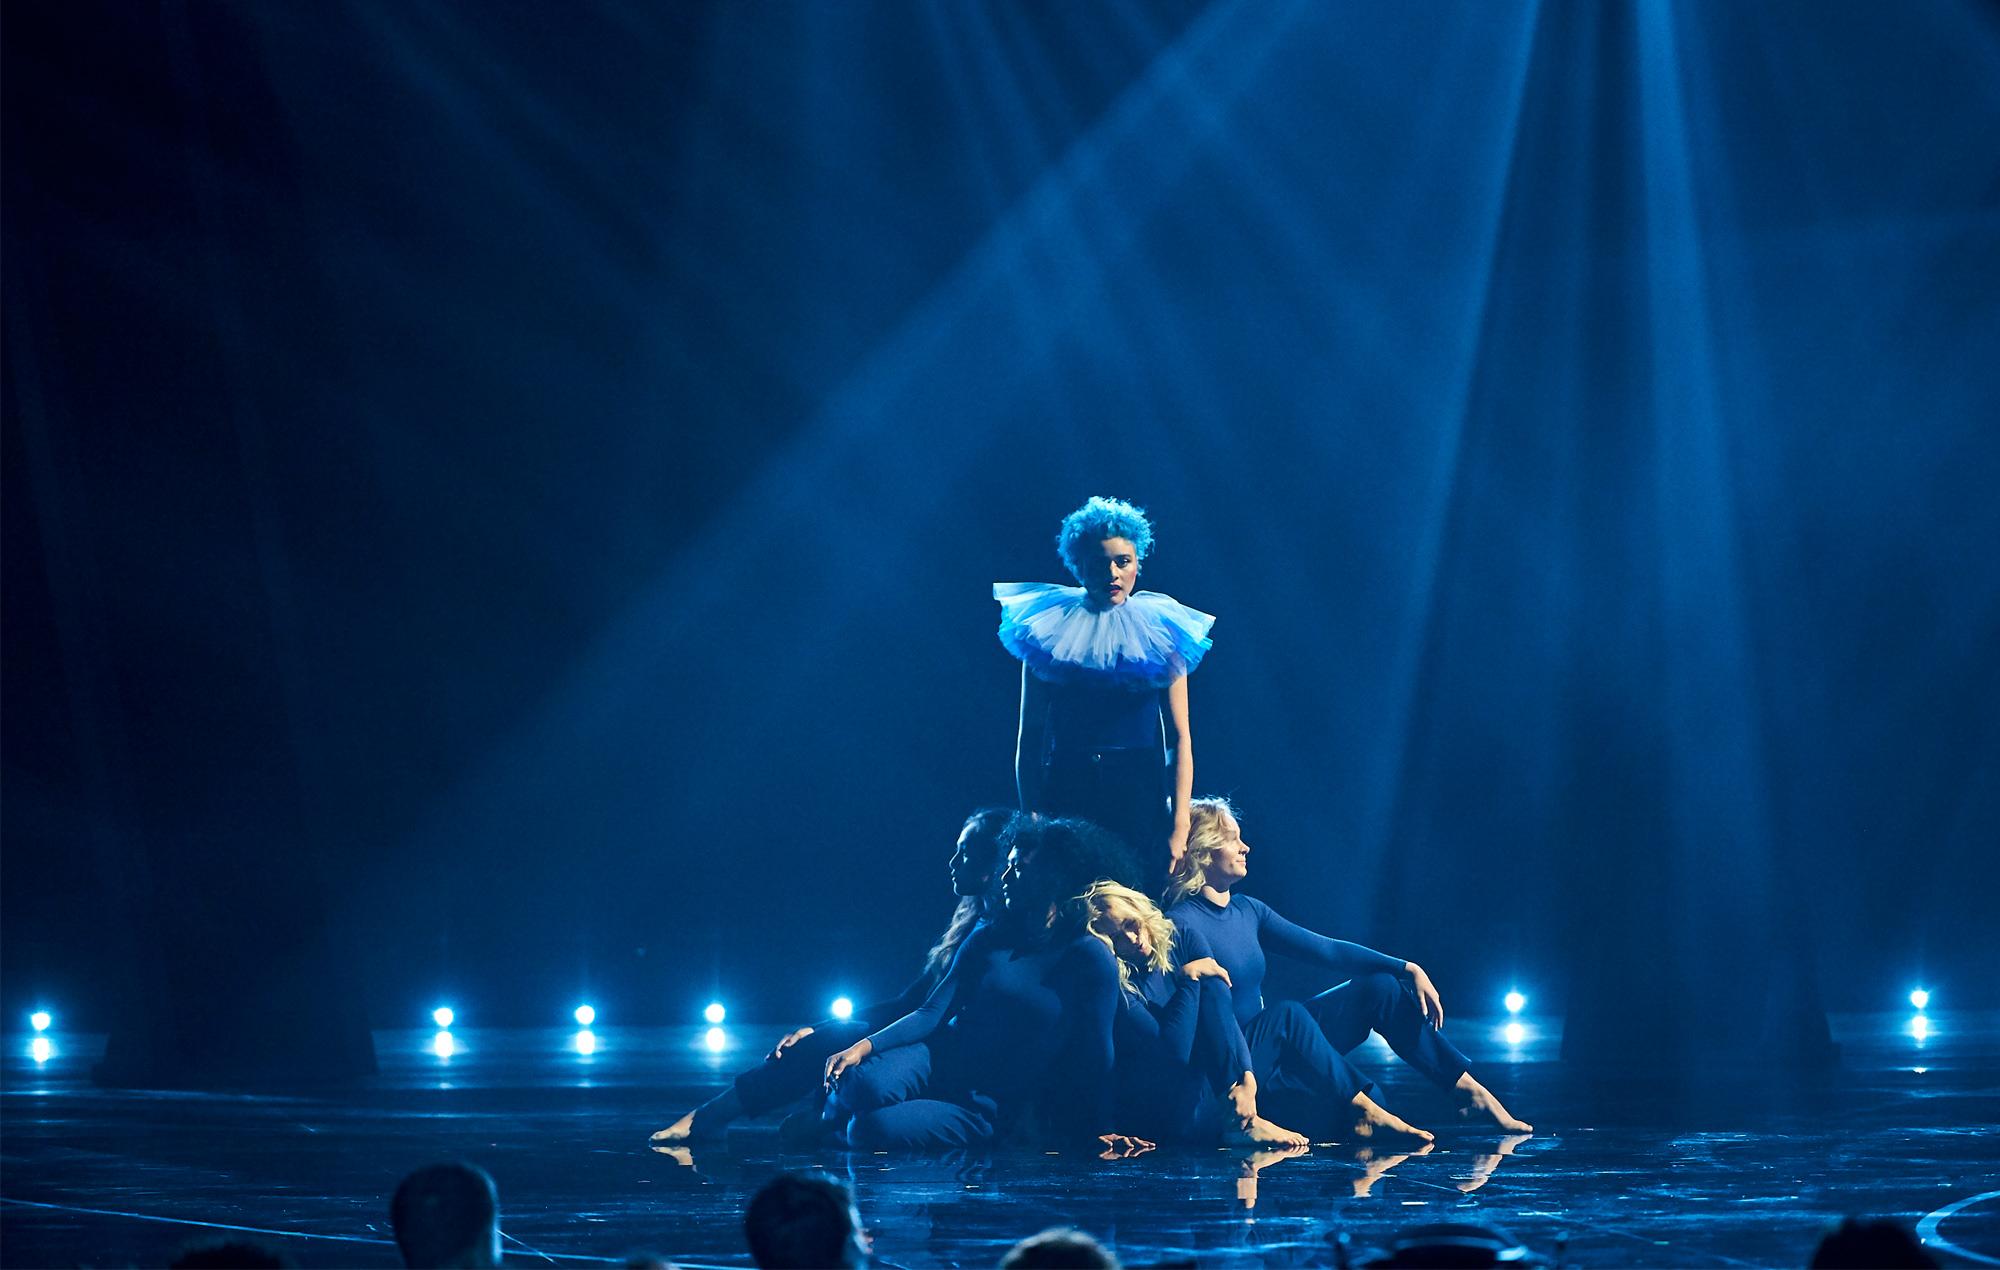 Montaigne Eurovision Australia Decides 2020